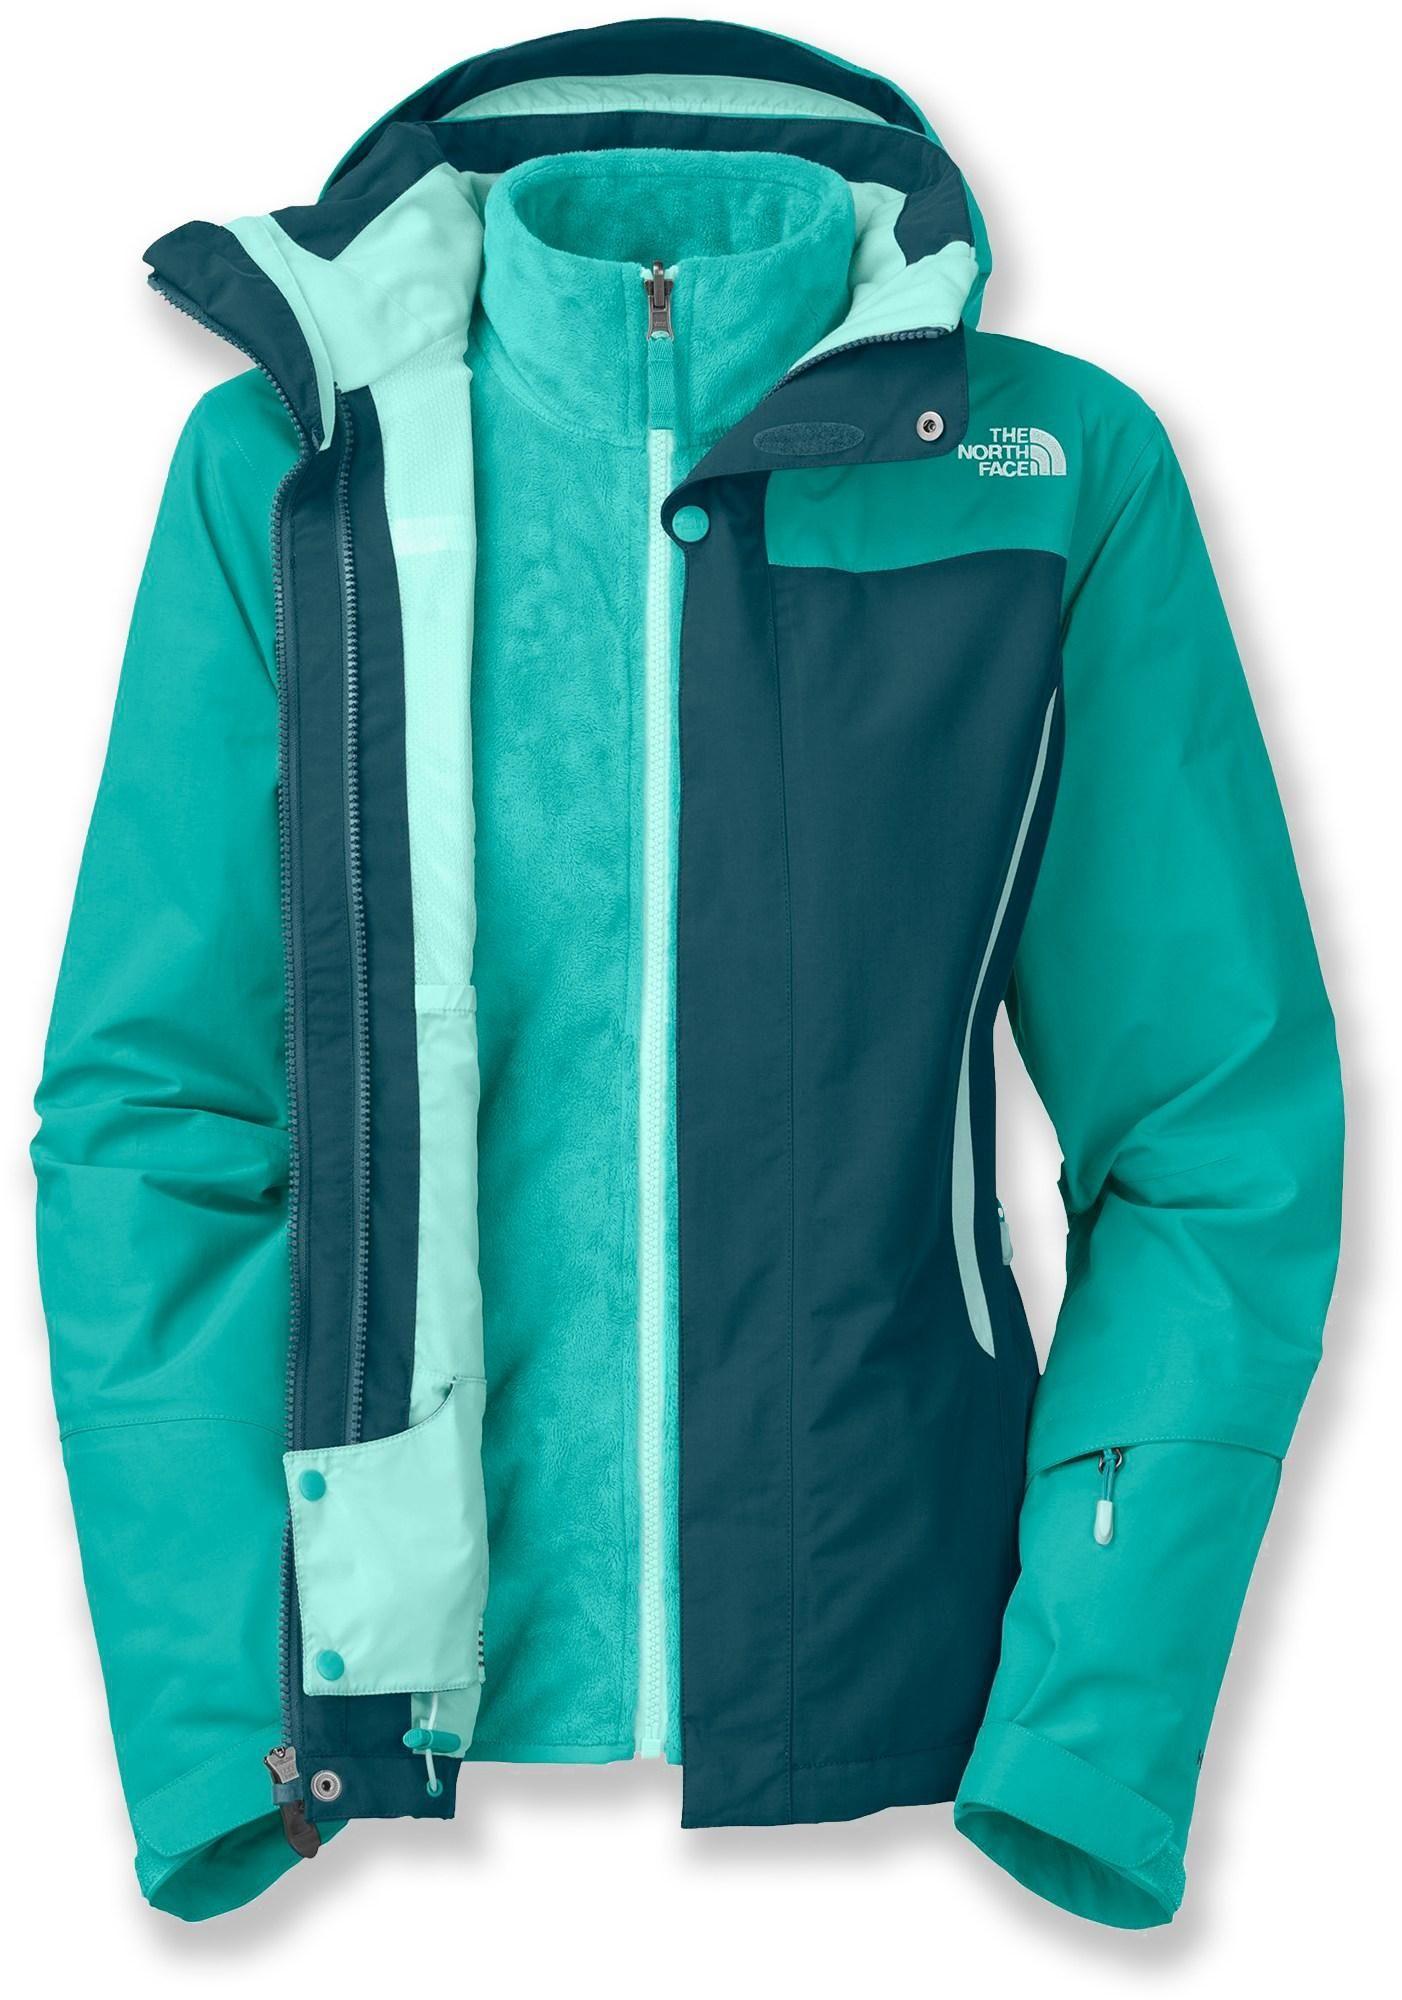 The North Face Kardiak Triclimate 3 In 1 Insulated Jacket Women S Rei Co Op Spor Giyim Mont Kadin [ 2000 x 1402 Pixel ]